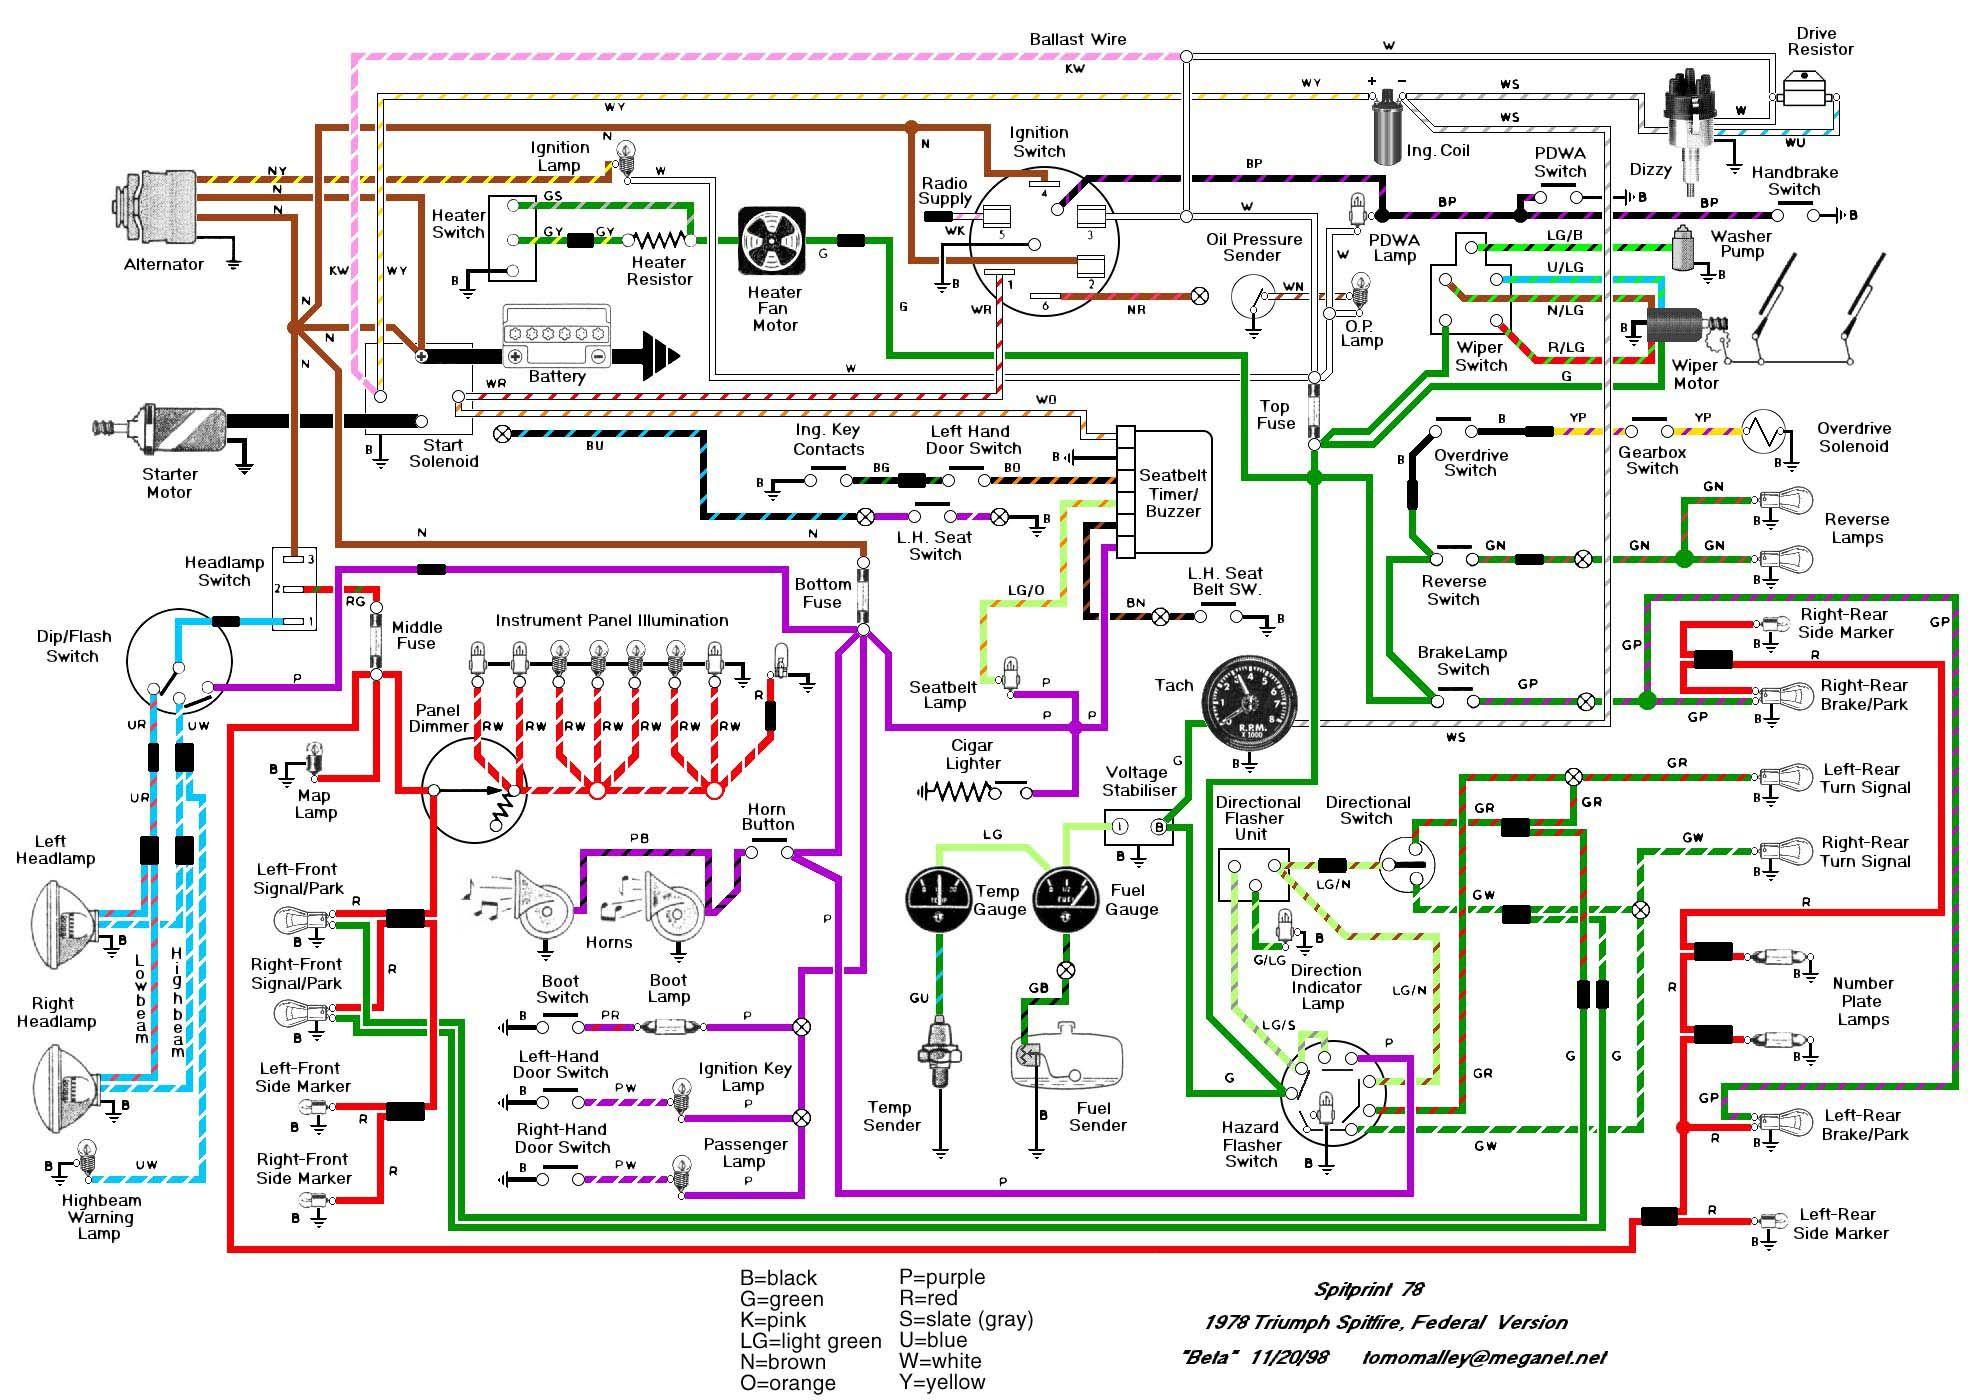 sparx wiring diagram for lights nn 9338  triumph motorcycle wiring diagrams wiring diagram  triumph motorcycle wiring diagrams